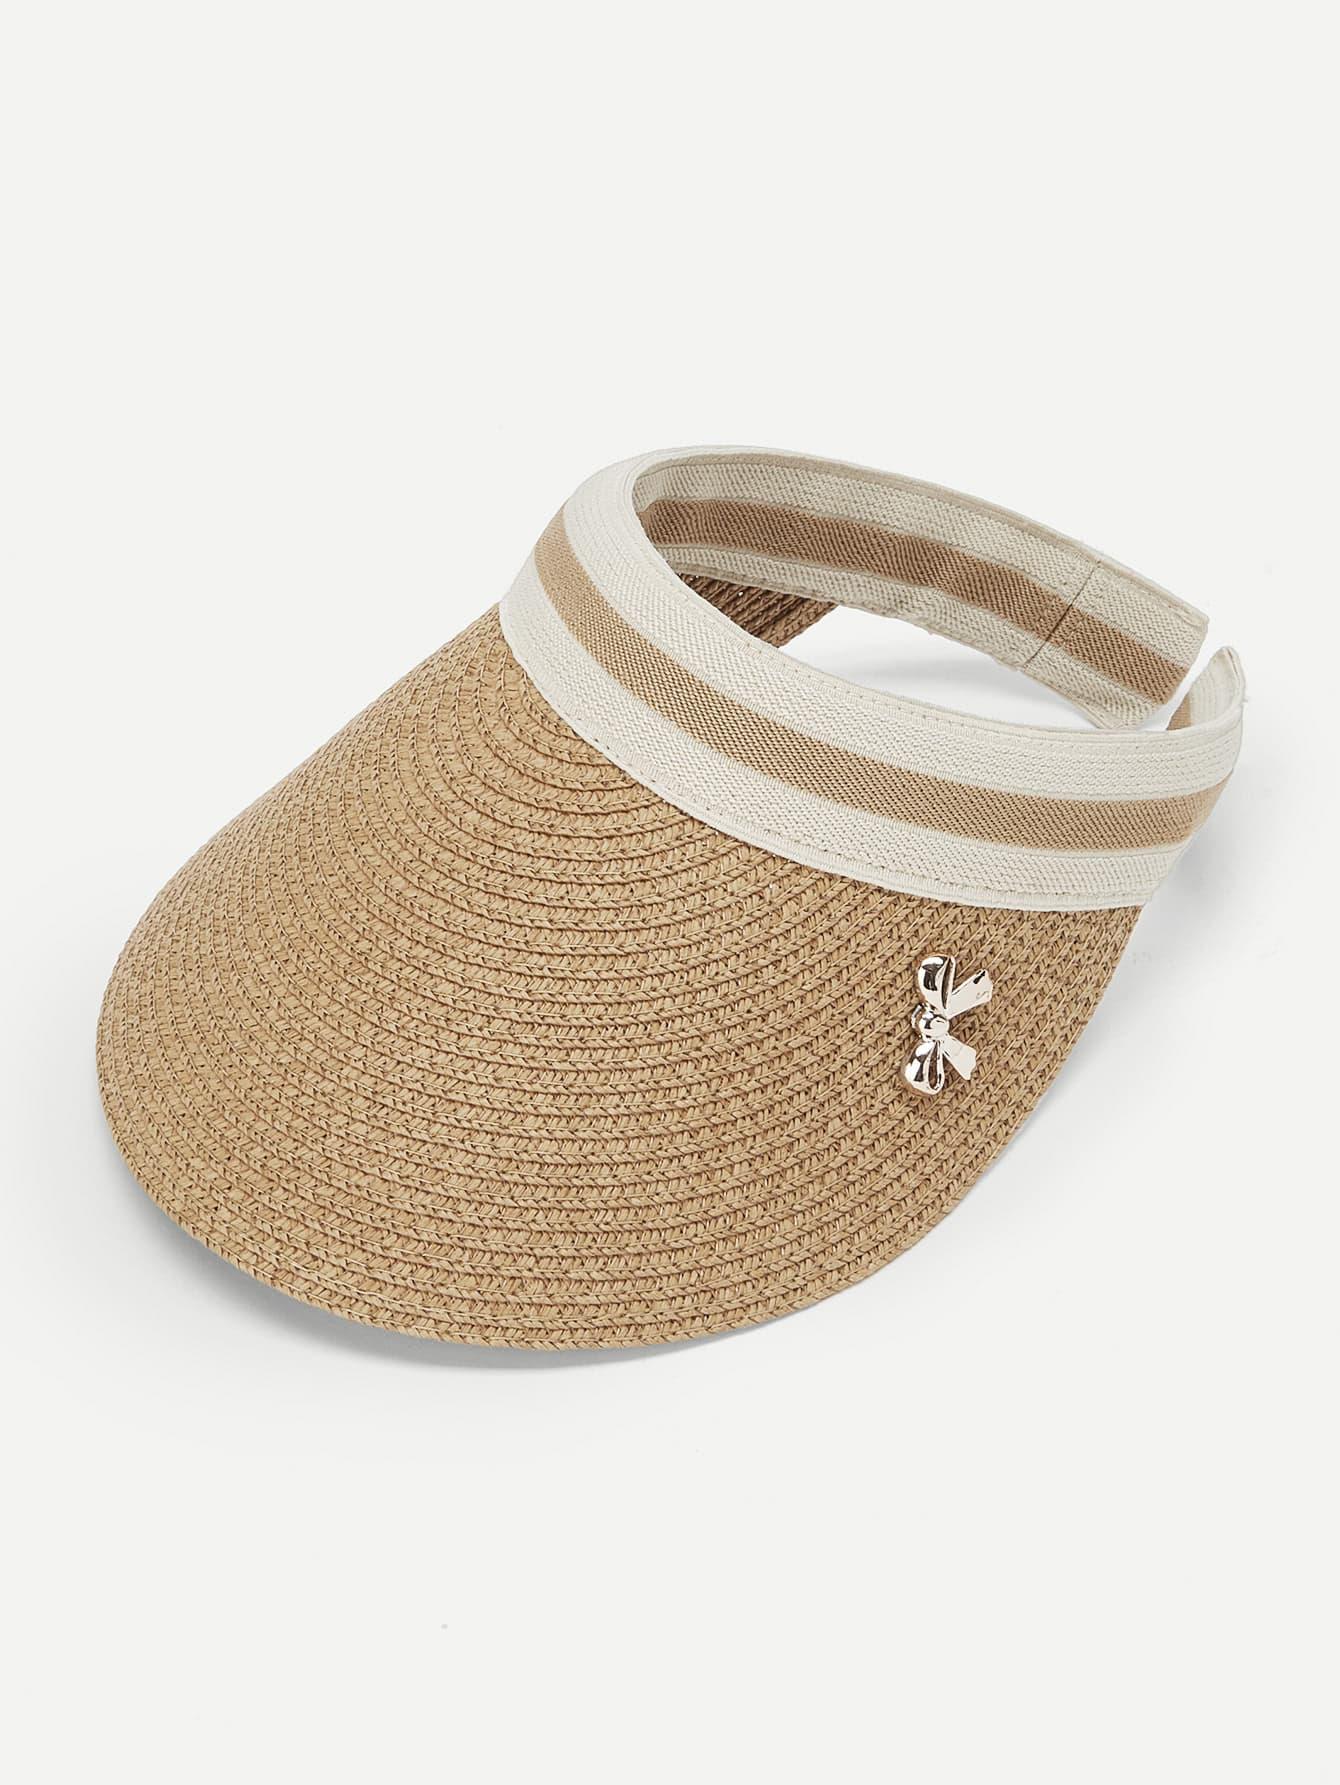 Bow Embellished Straw Visor Hat